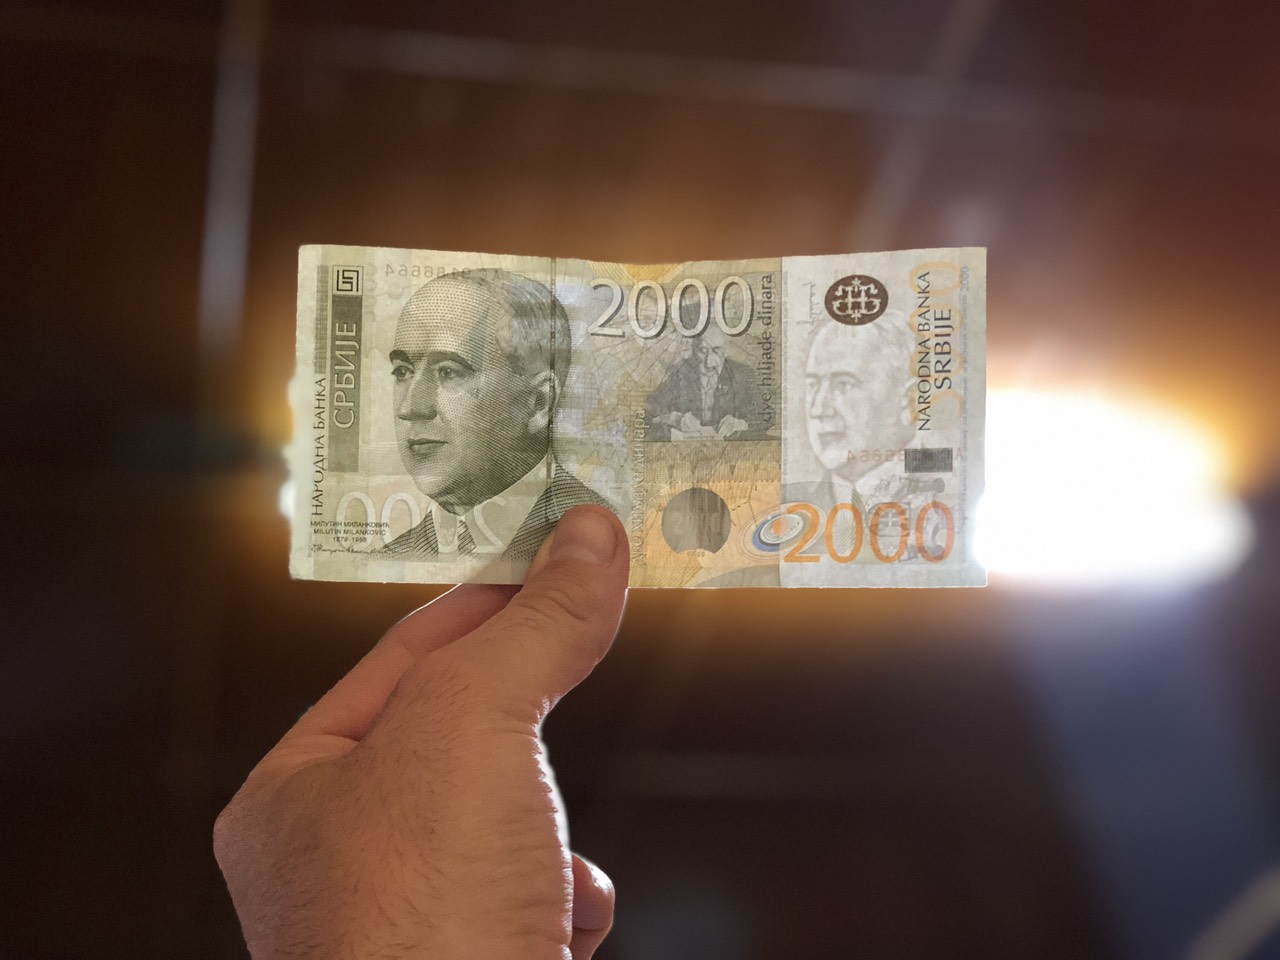 2000 dinara, foto: M. Miladinović